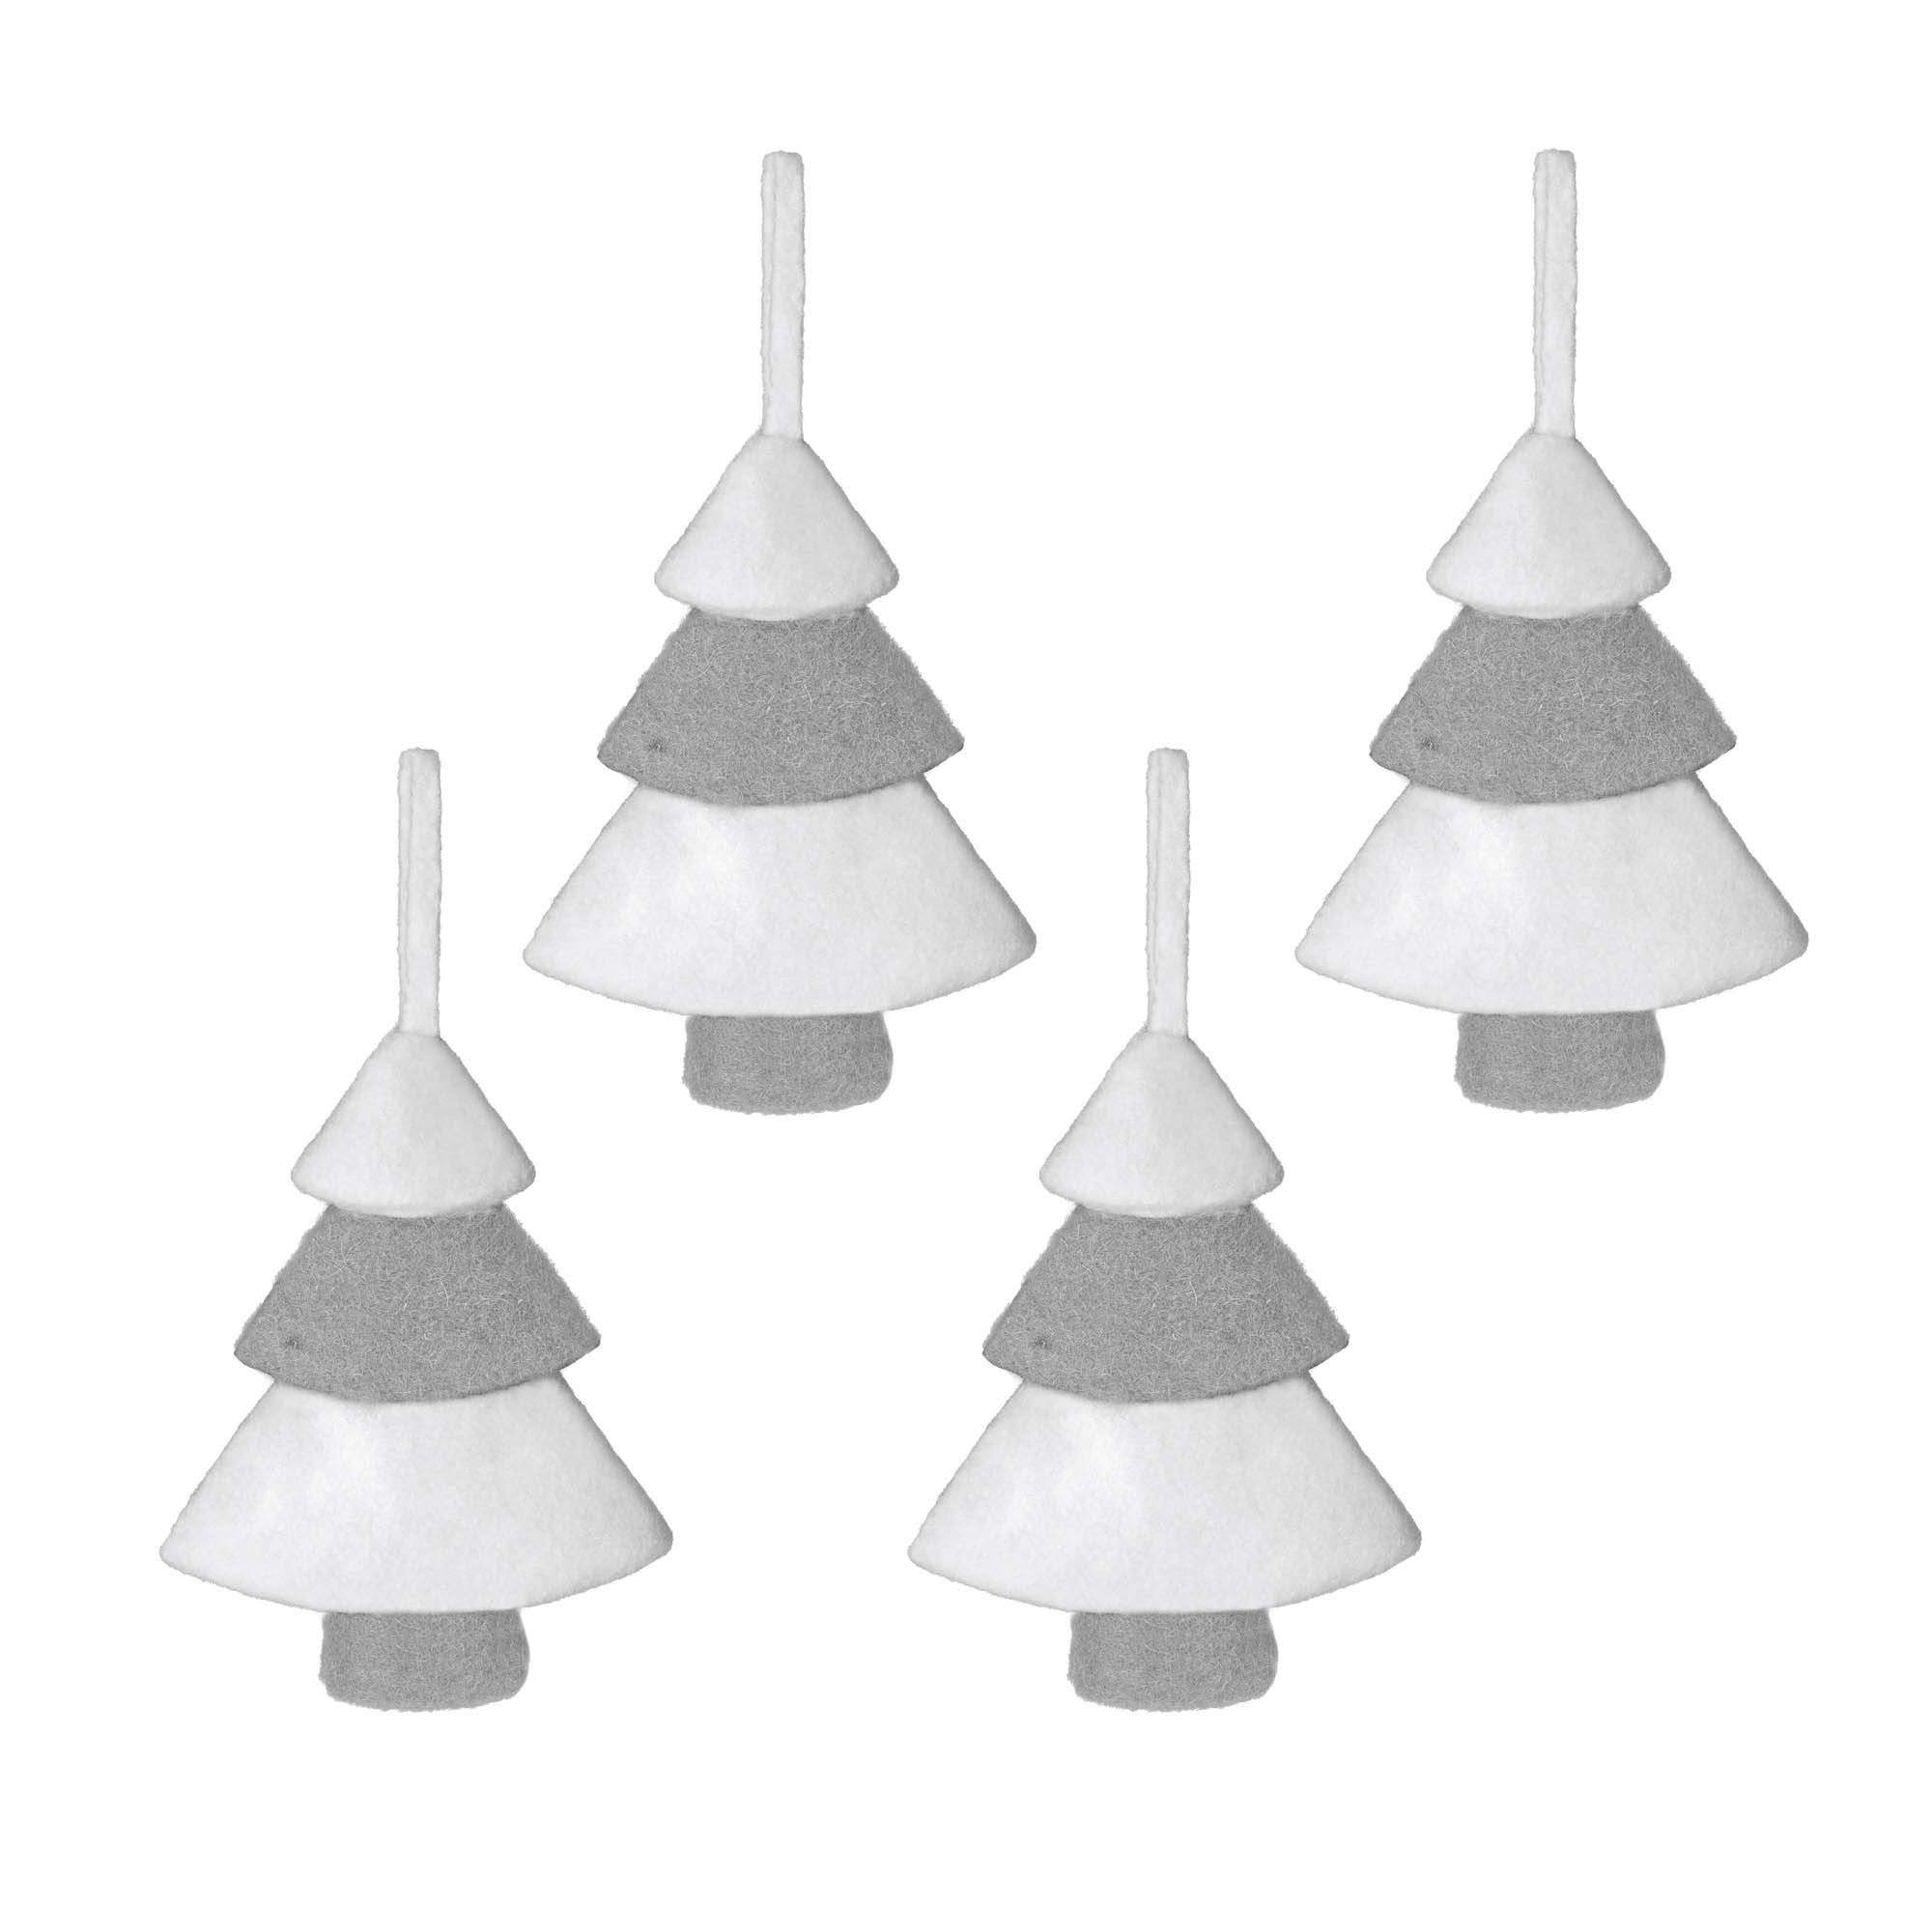 Kave Home Set Clemons di 4 ciondoli decorativi per alberi di Natale